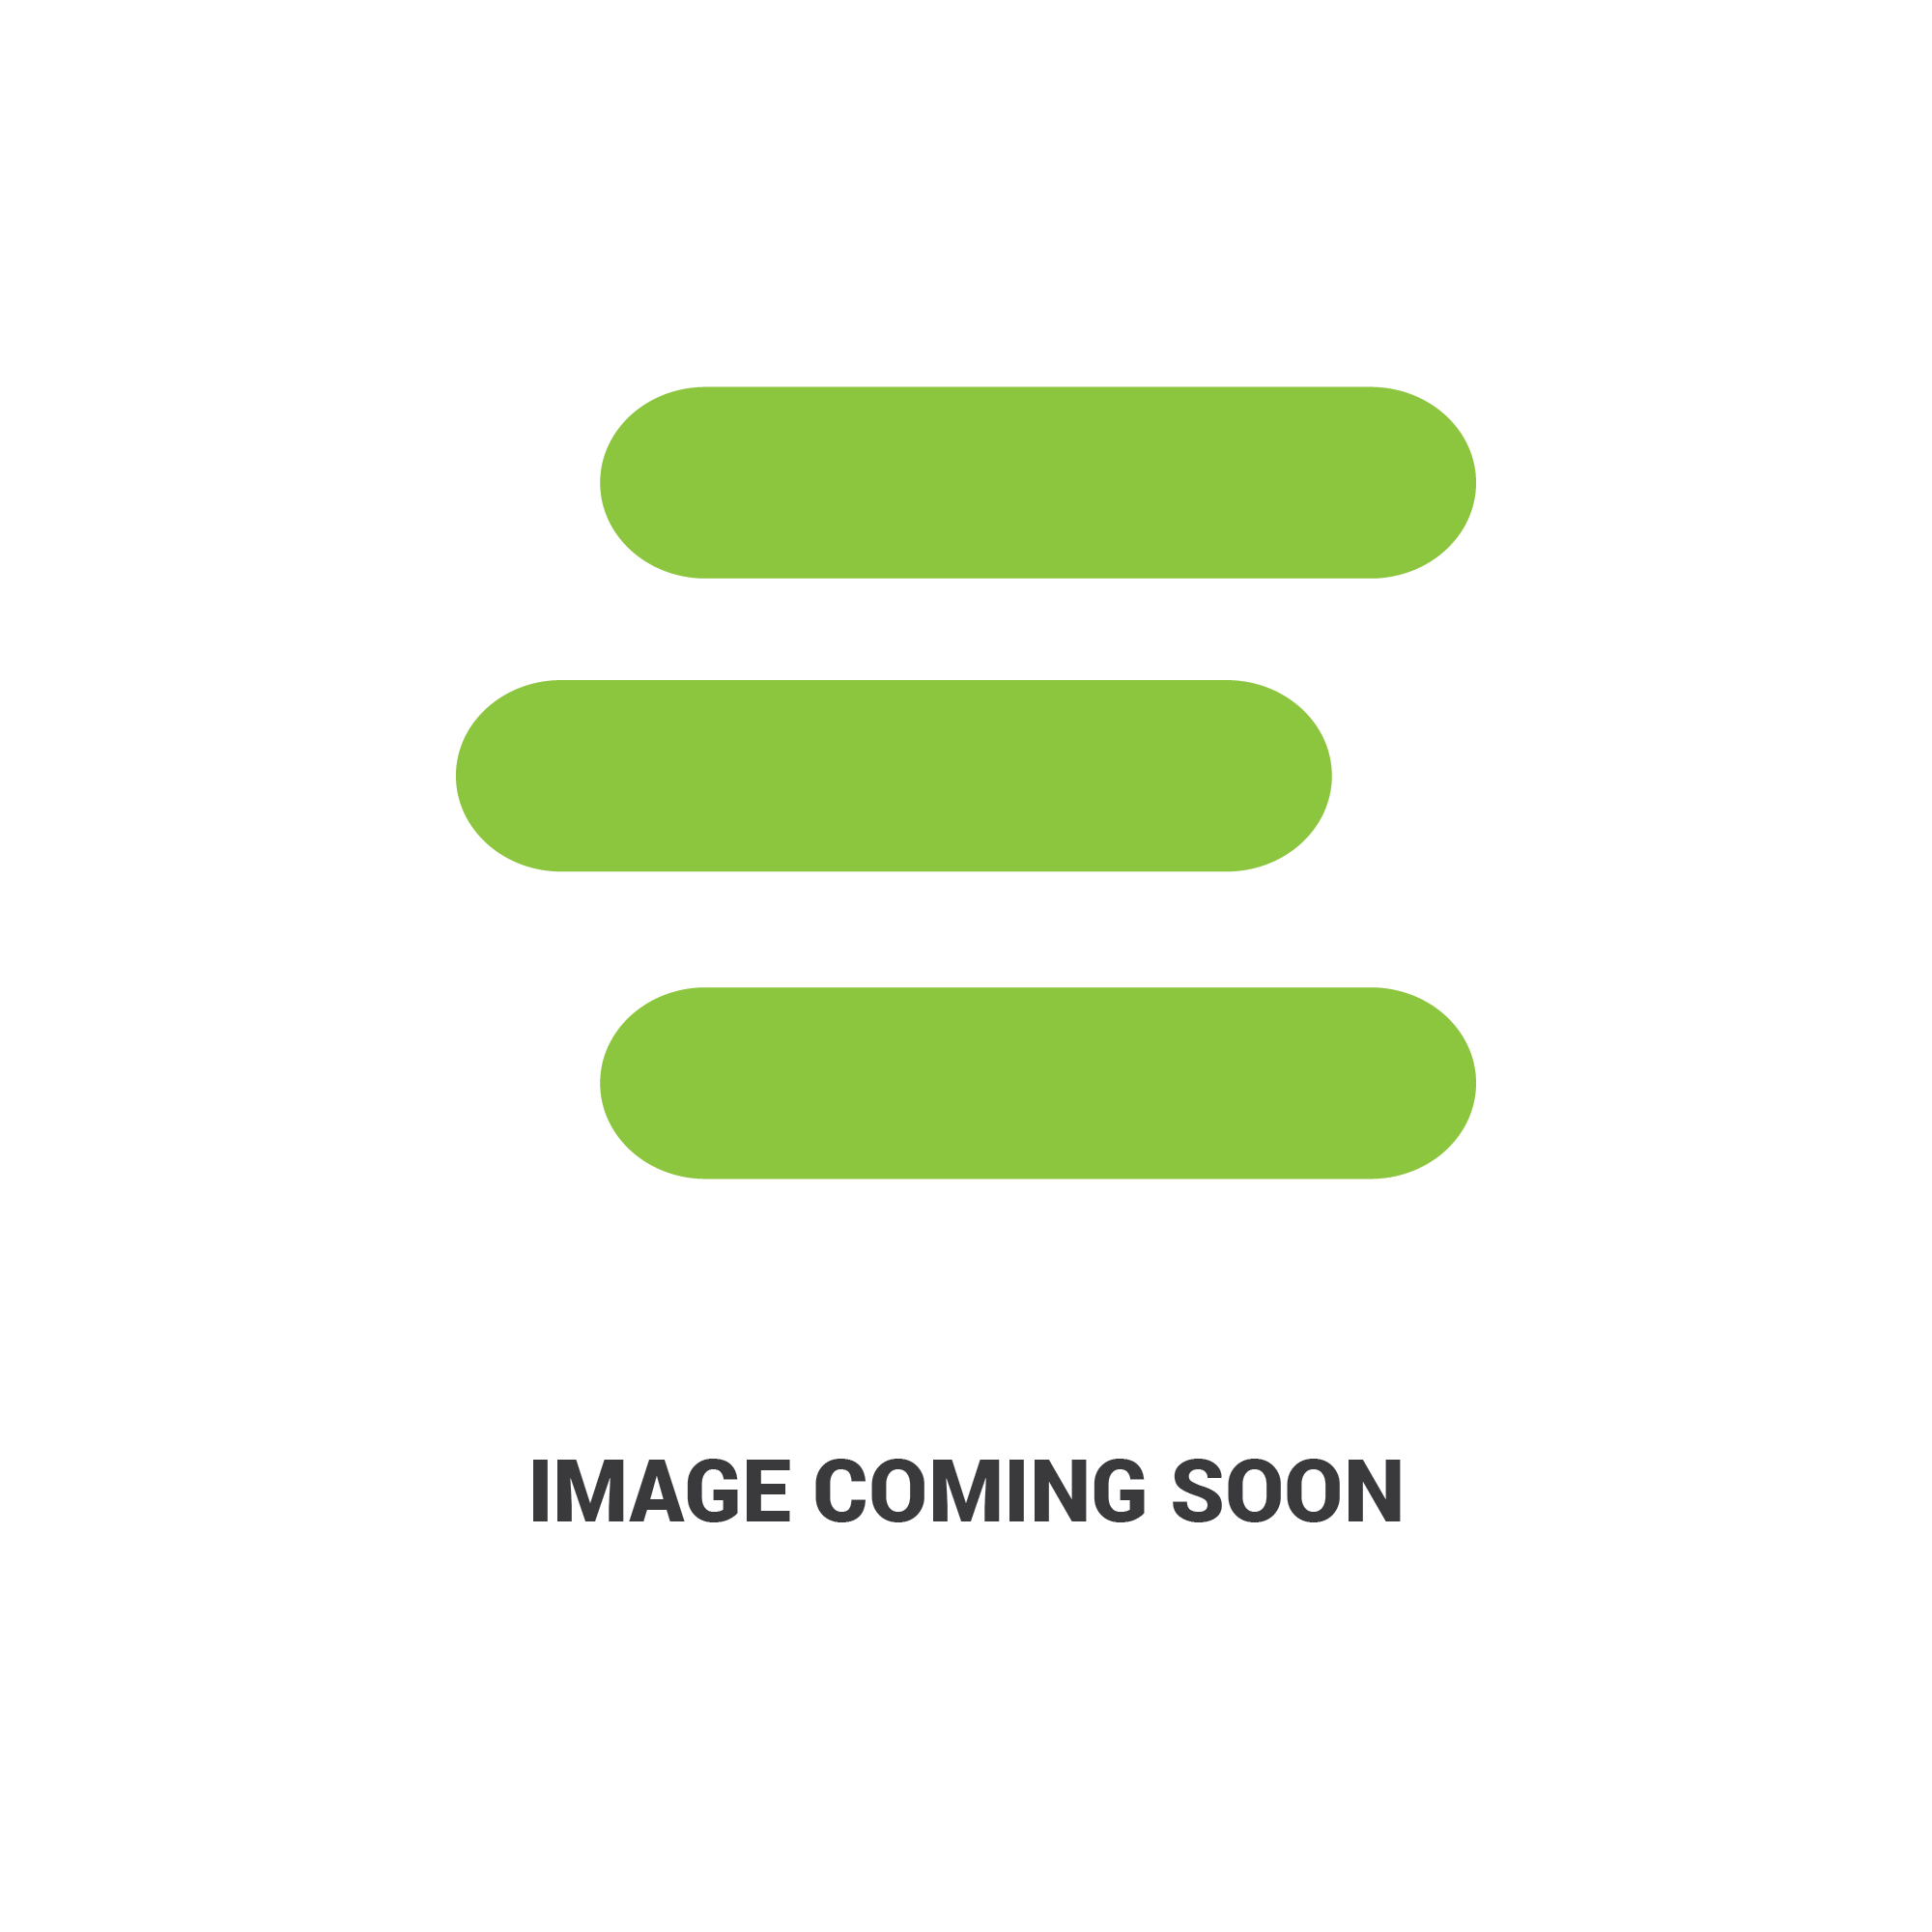 E-15241-320991968_1.jpg